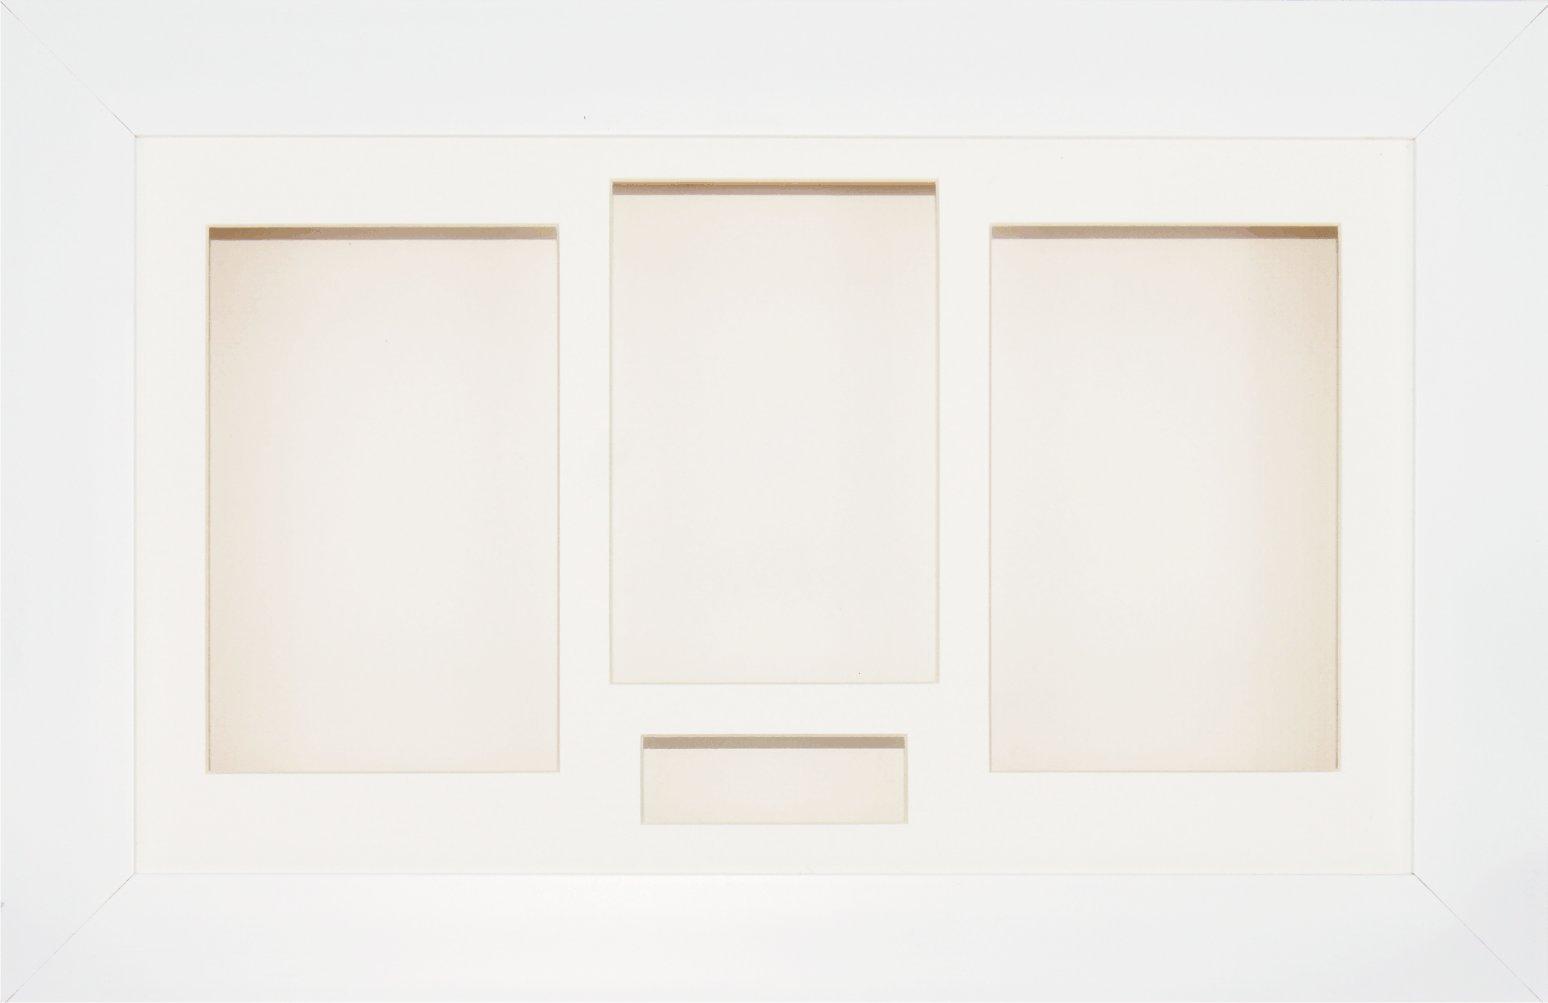 BabyRice 14.5x8.5'' White Shadow Box 3D Medal Keepsake Casts Flowers Display Frame / Cream 4 Aperture Mount / Cream backing